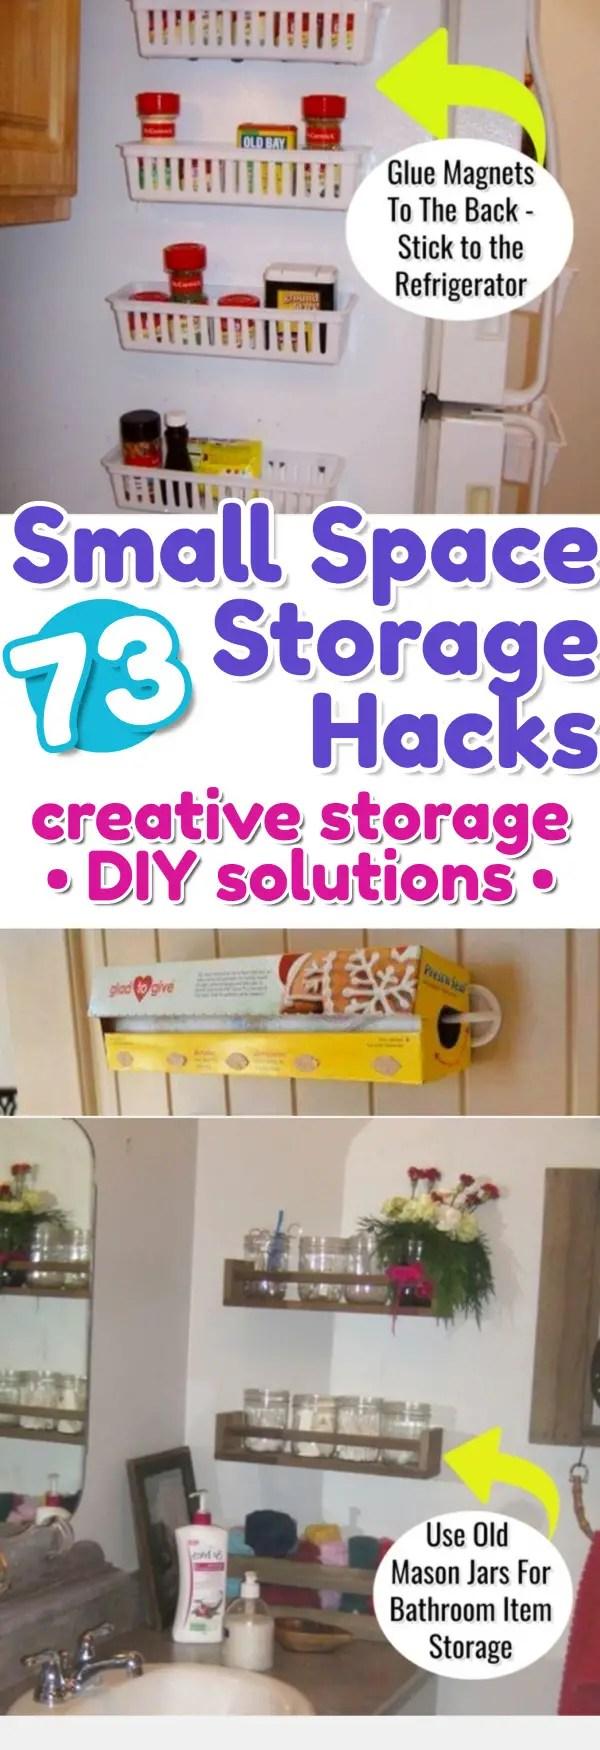 Storage Hacks For Small Spaces Small Space Storage Hacks  #organizationideasforthehome #getorganized #lifehacks #